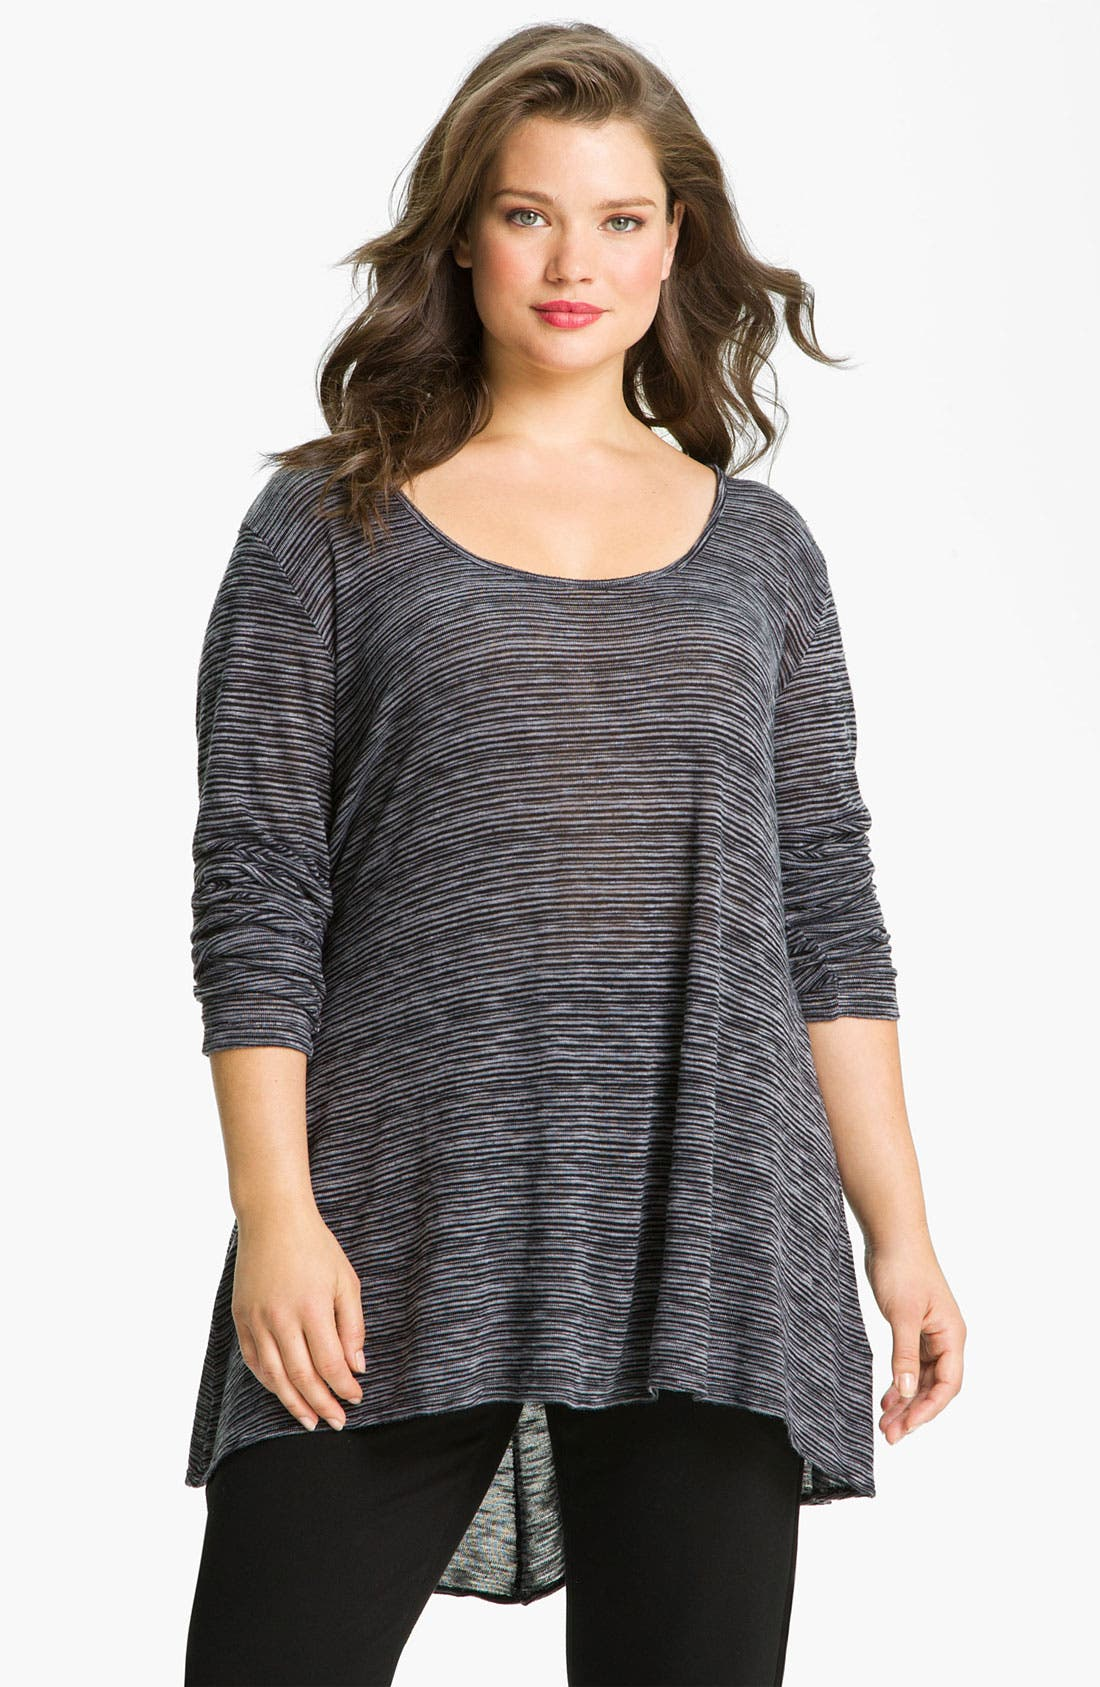 Alternate Image 1 Selected - Allen Allen Sweater Stripe Asymmetric Tee (Plus)